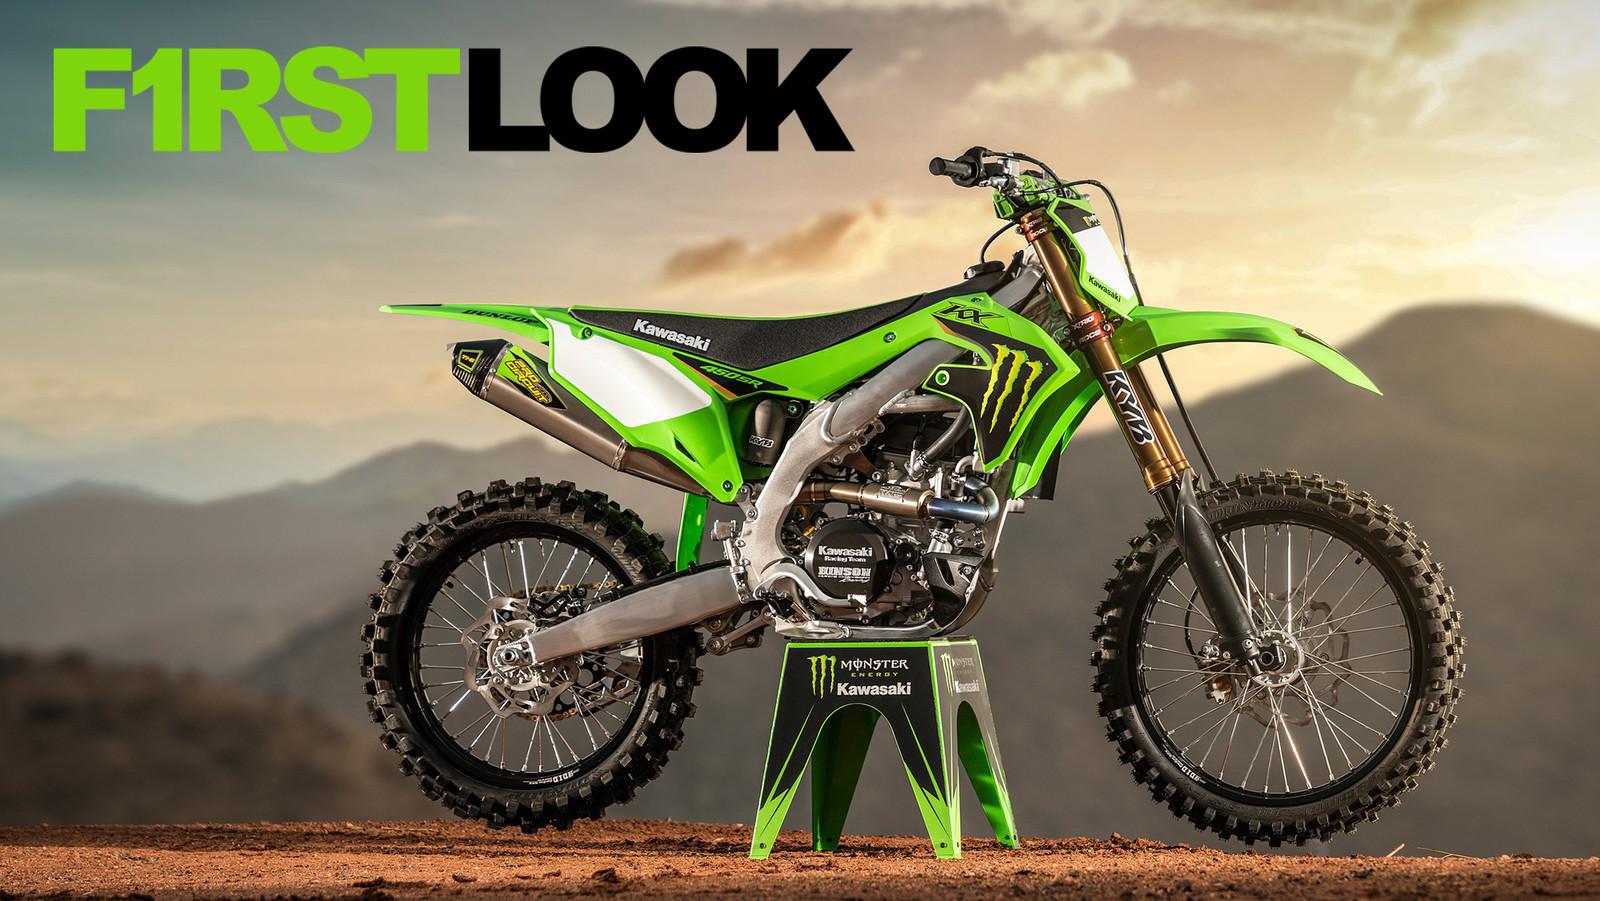 First Look: 2022 Kawasaki KX450SR (Special Racer Edition)